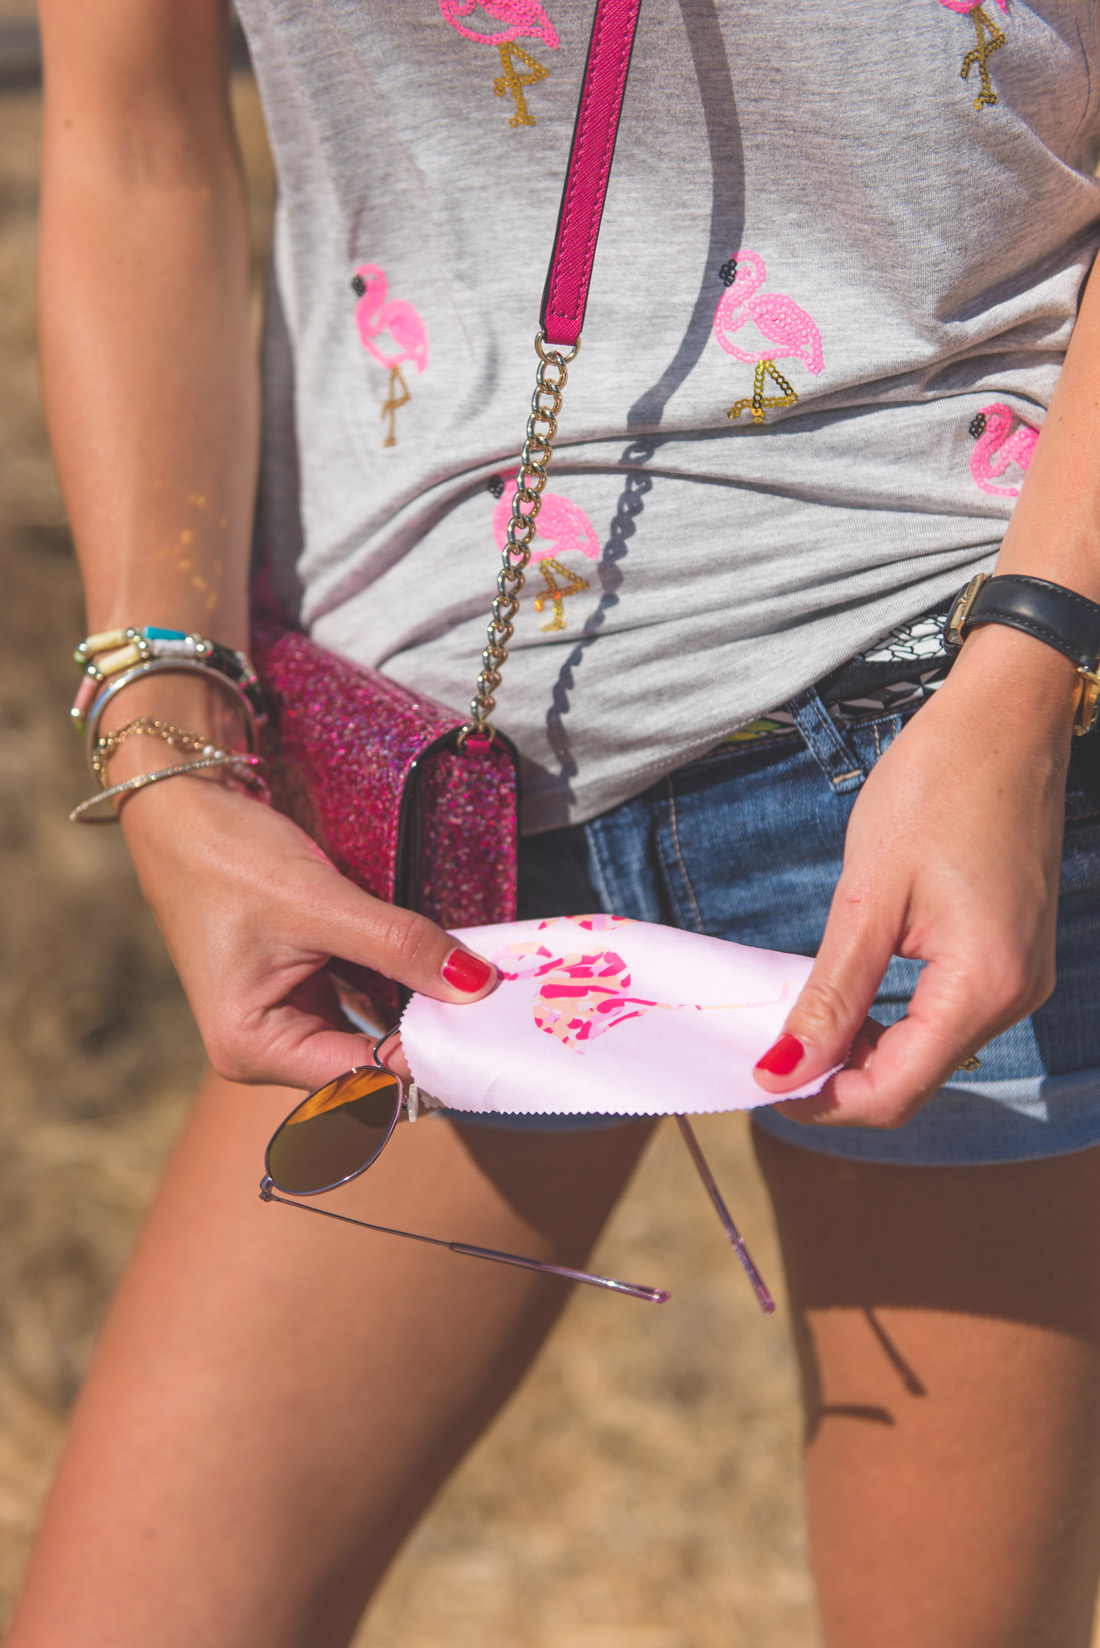 Bag-at-you---Fashion-blog---Polette-eyewear---California-design